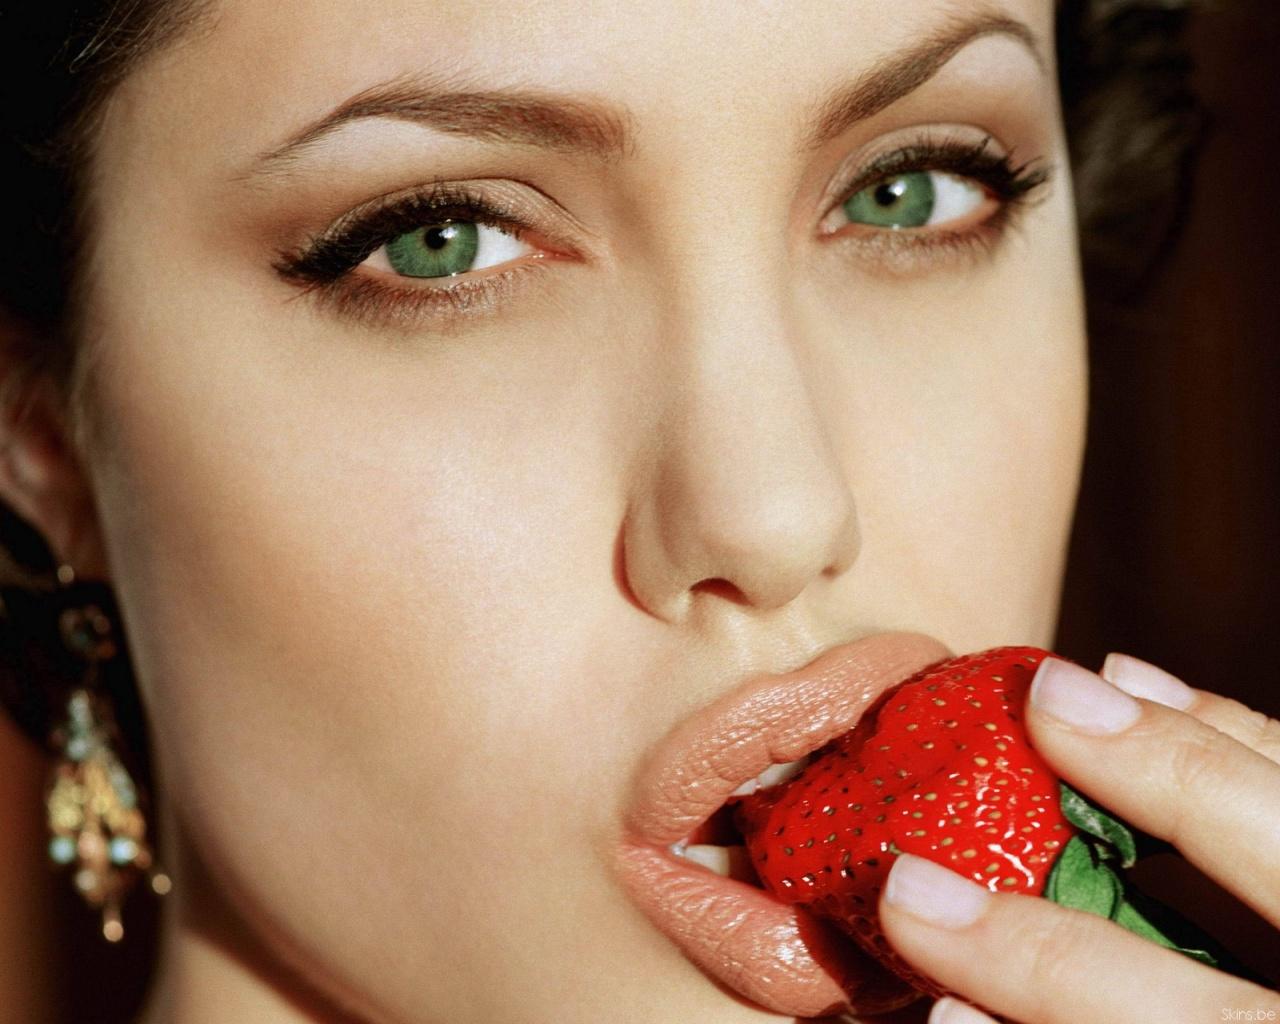 http://maria-visage.ru/wp-content/uploads/2013/04/green_eyes.jpg